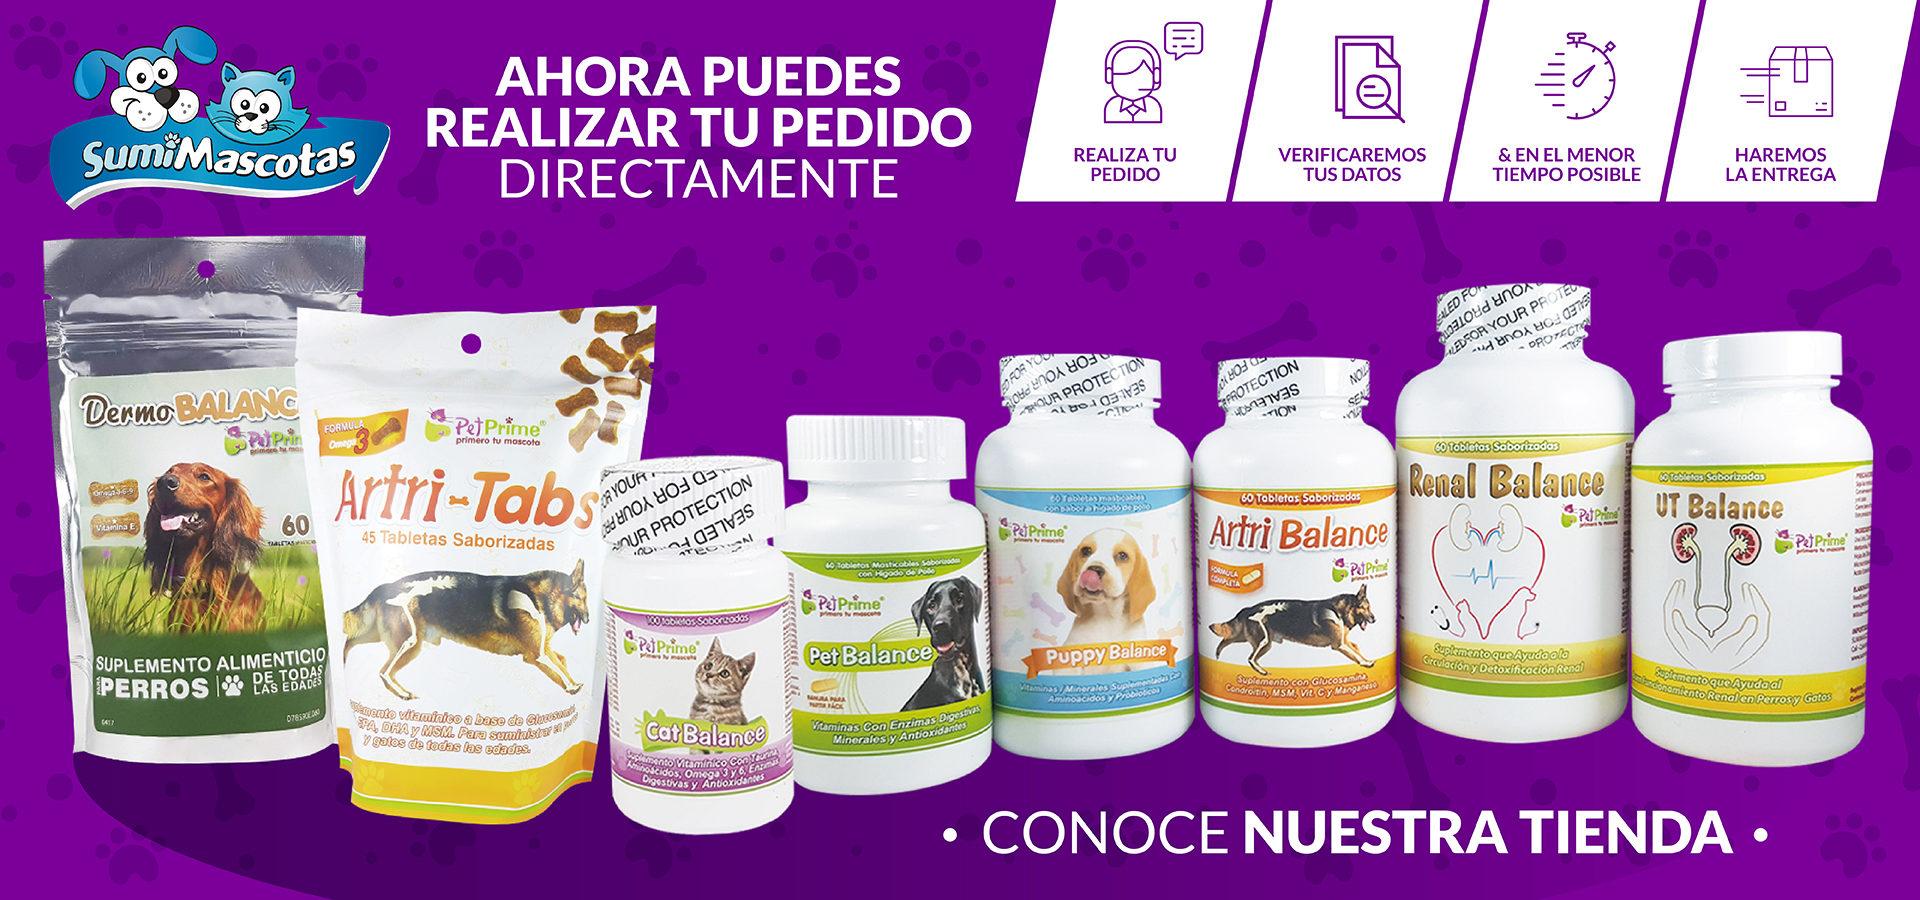 https://sumimascotas.com/wp-content/uploads/2018/08/Porpuesta-web-2-05-1920x900.jpg